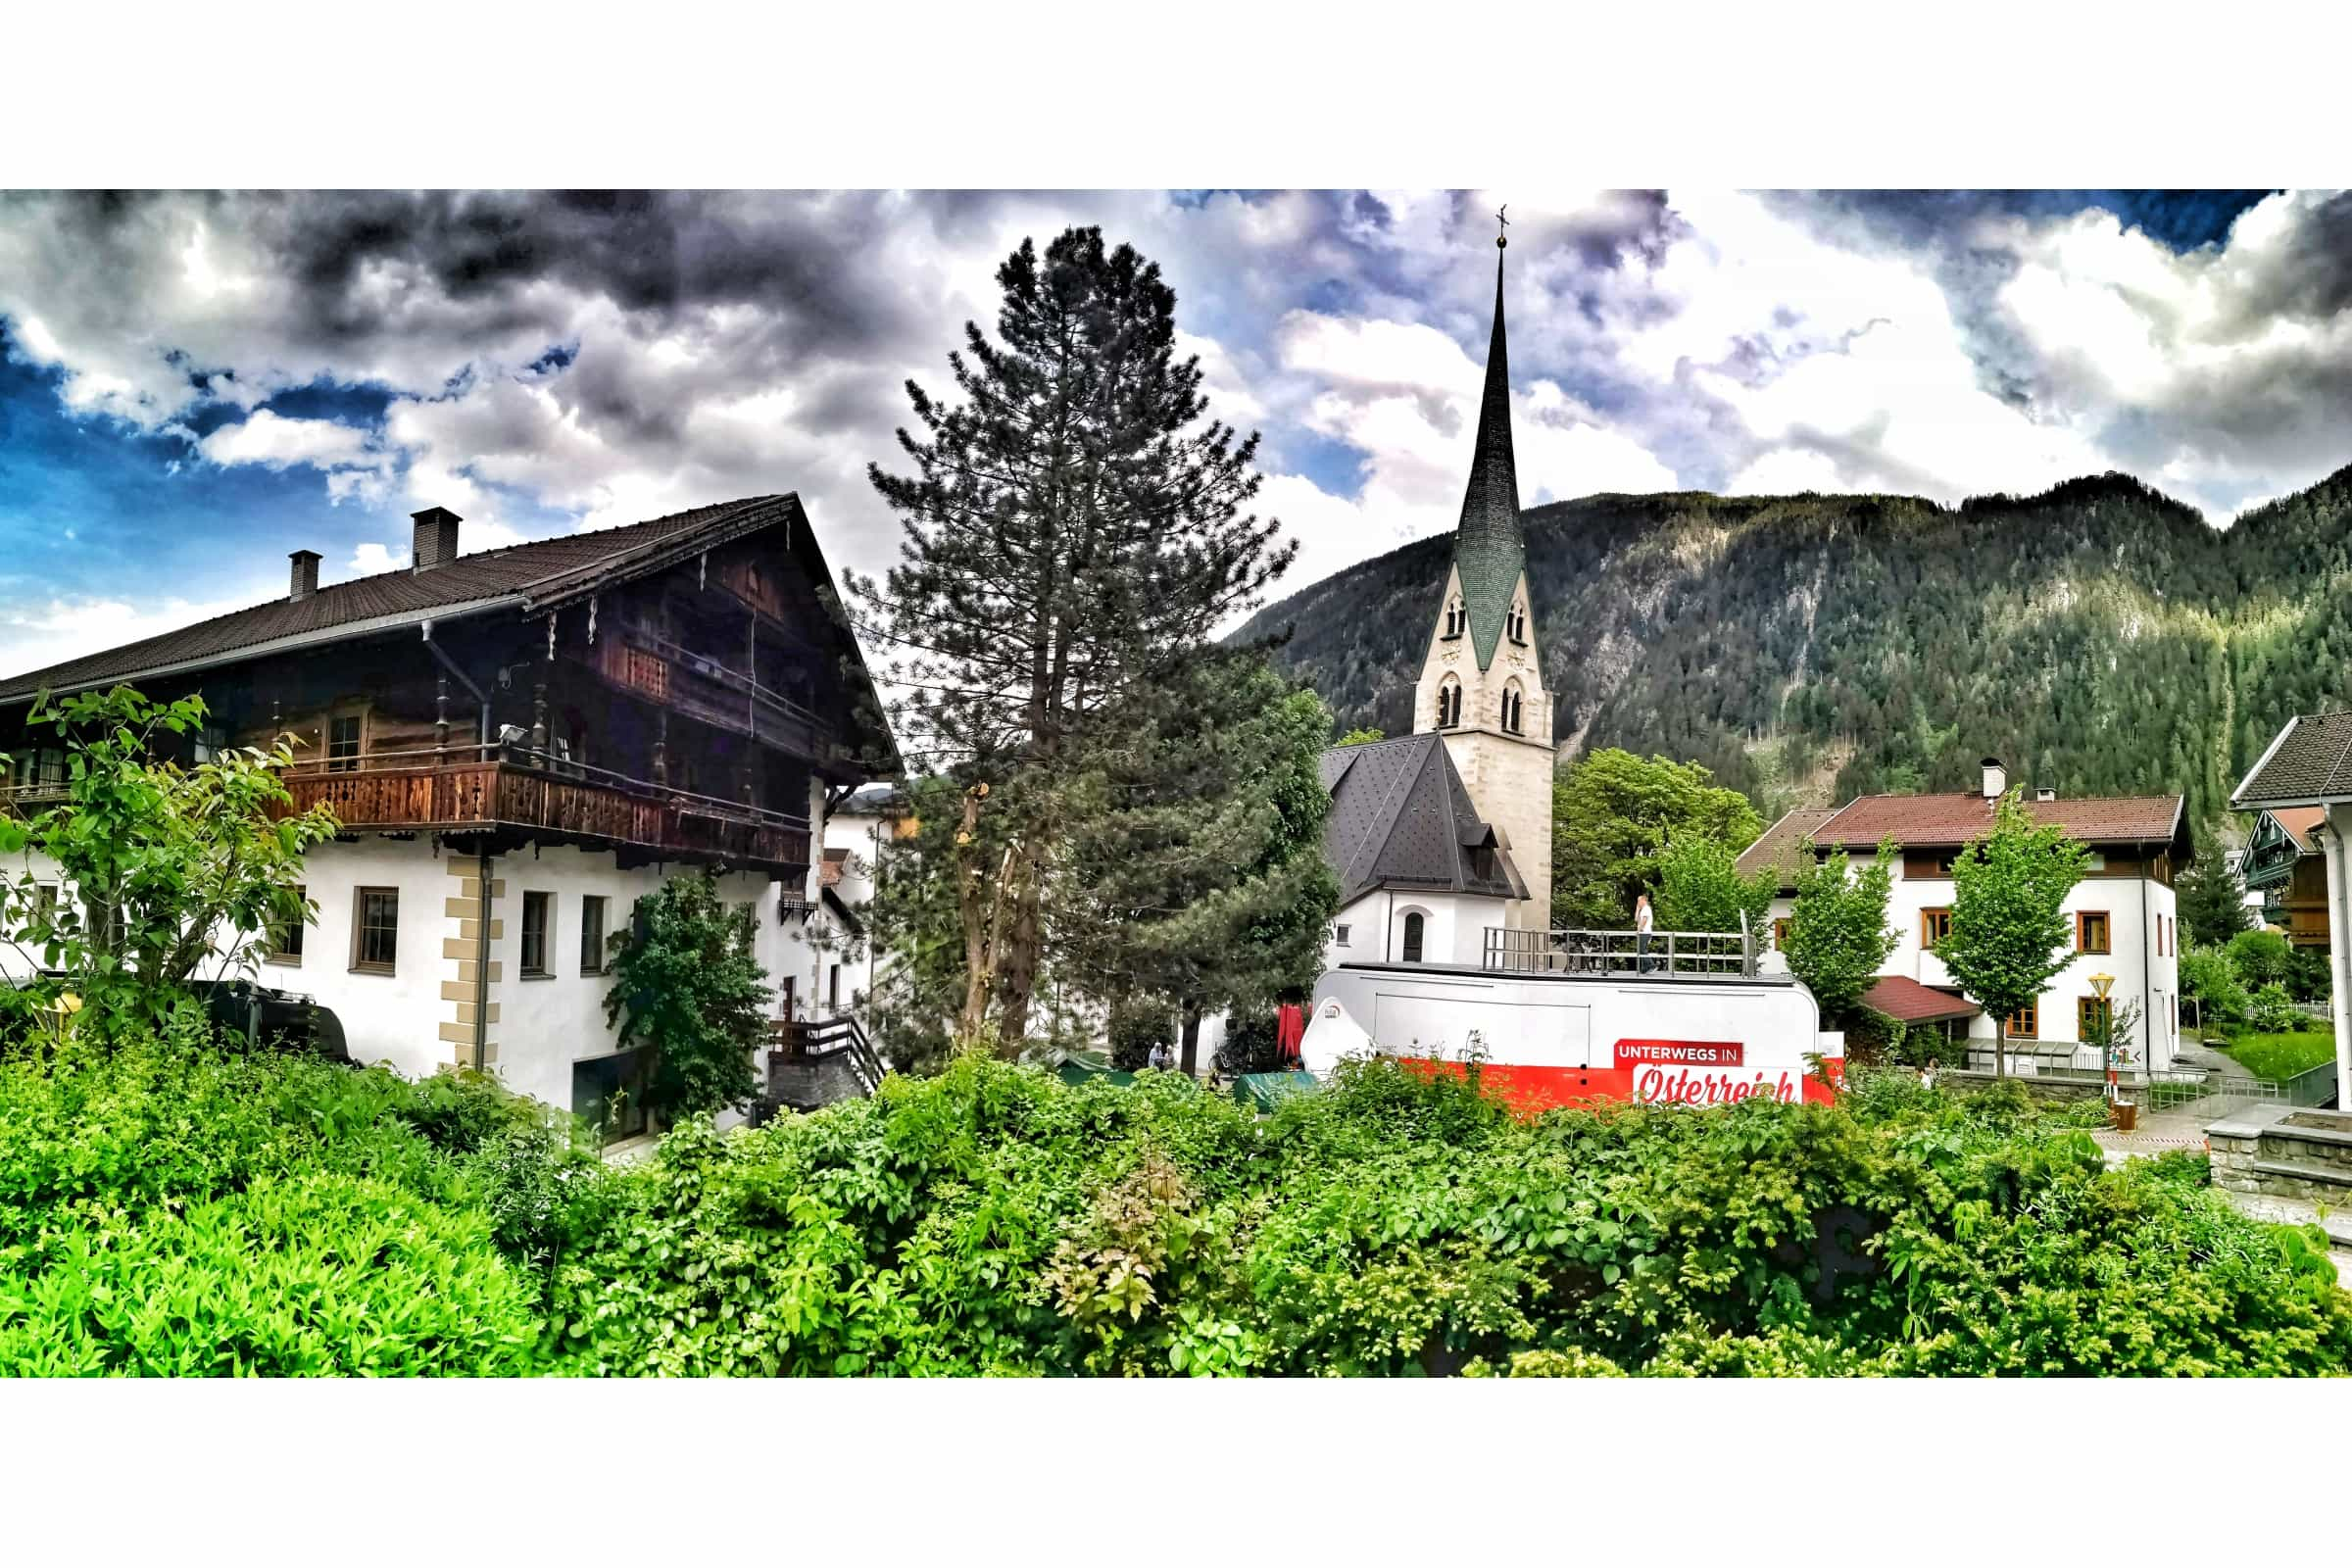 andreas felder kameramann orf unterwegs in österreich 03 02.05.2018 16 39 50 - ORF Unterwegs in Österreich - Tirol